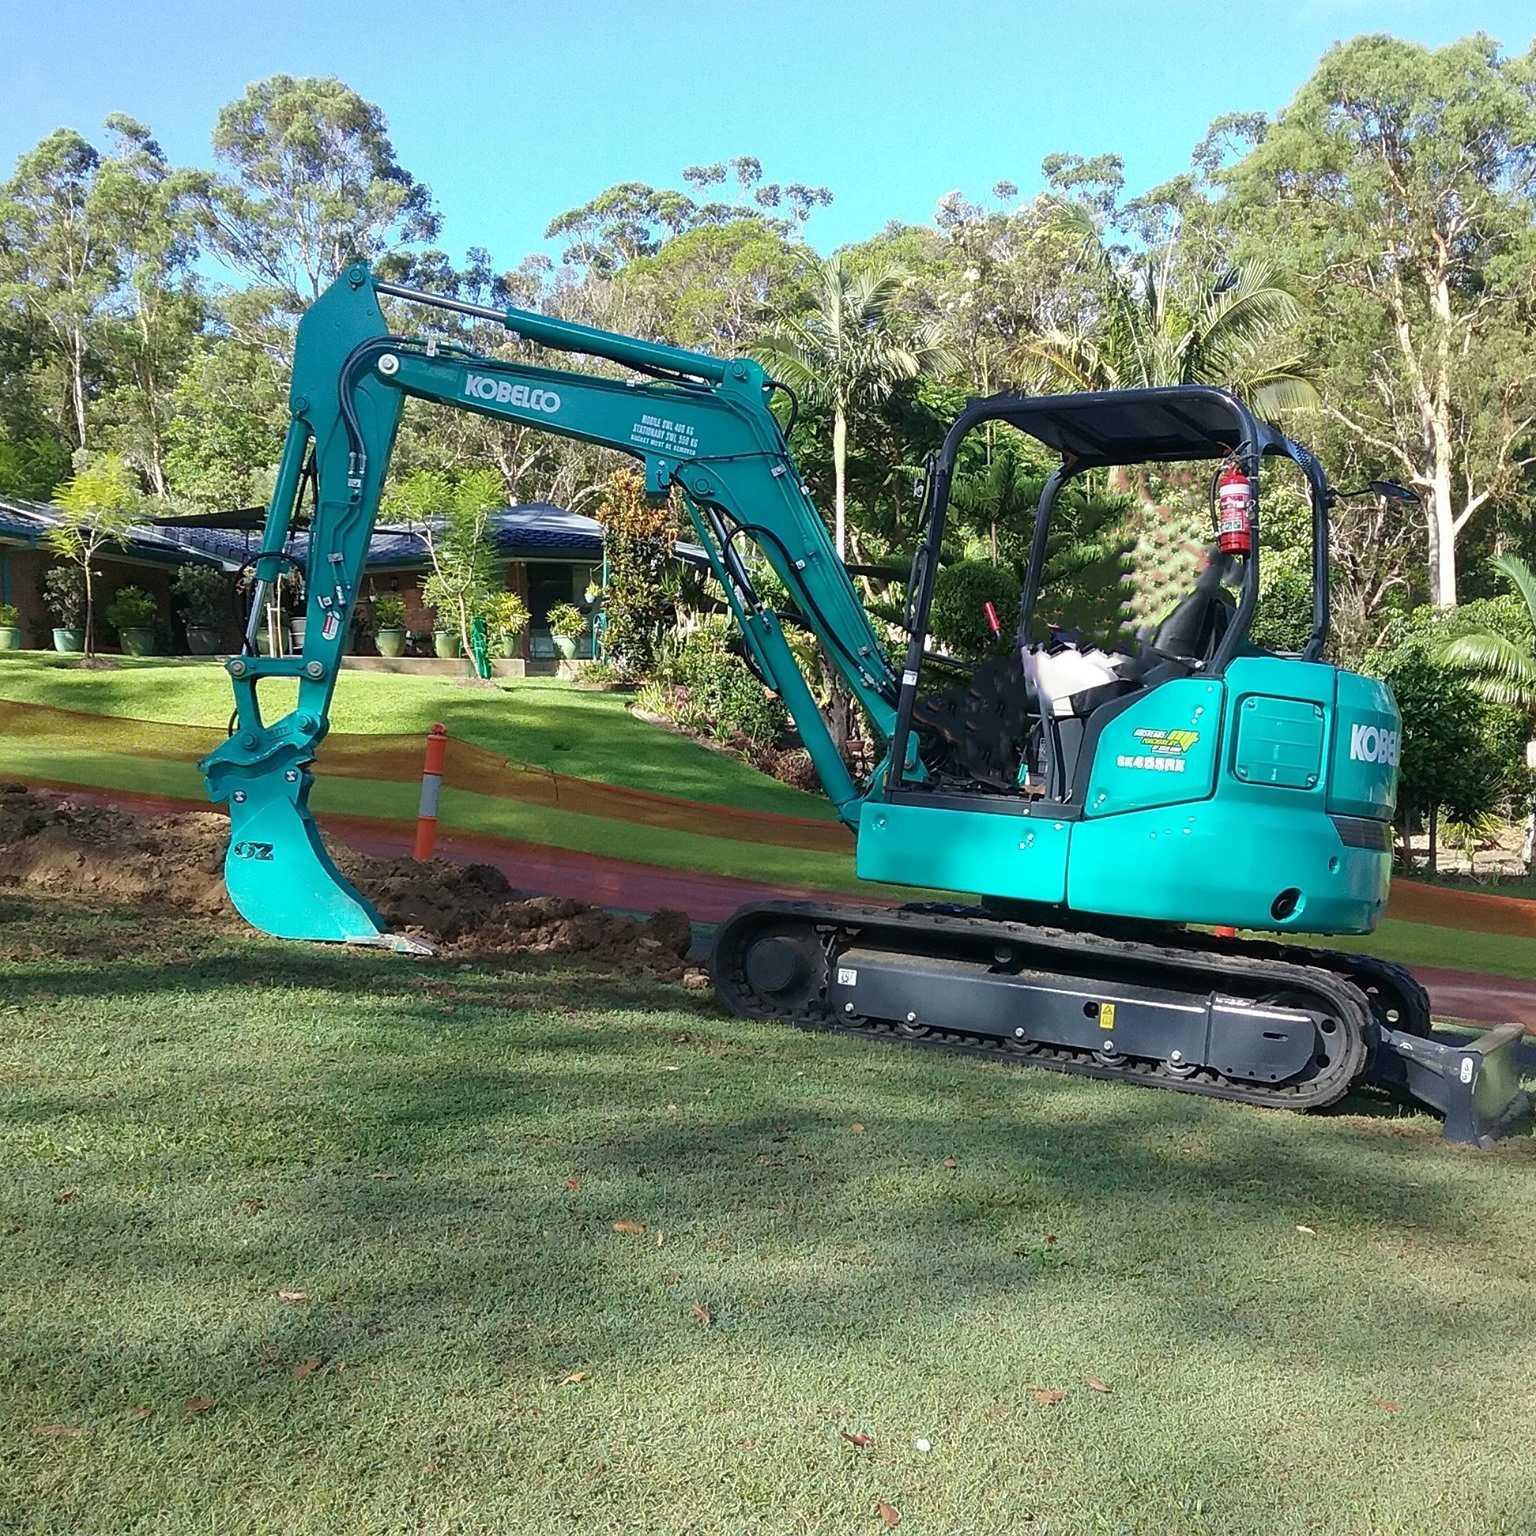 4.5t ton excavator for wet hire (with operator) -  Maudsland, Pacific Pines Gaven, Molendinar, Mount Nathan, Nerang, Ashmore Advancetown, Gilston, Highland Park, Carrara